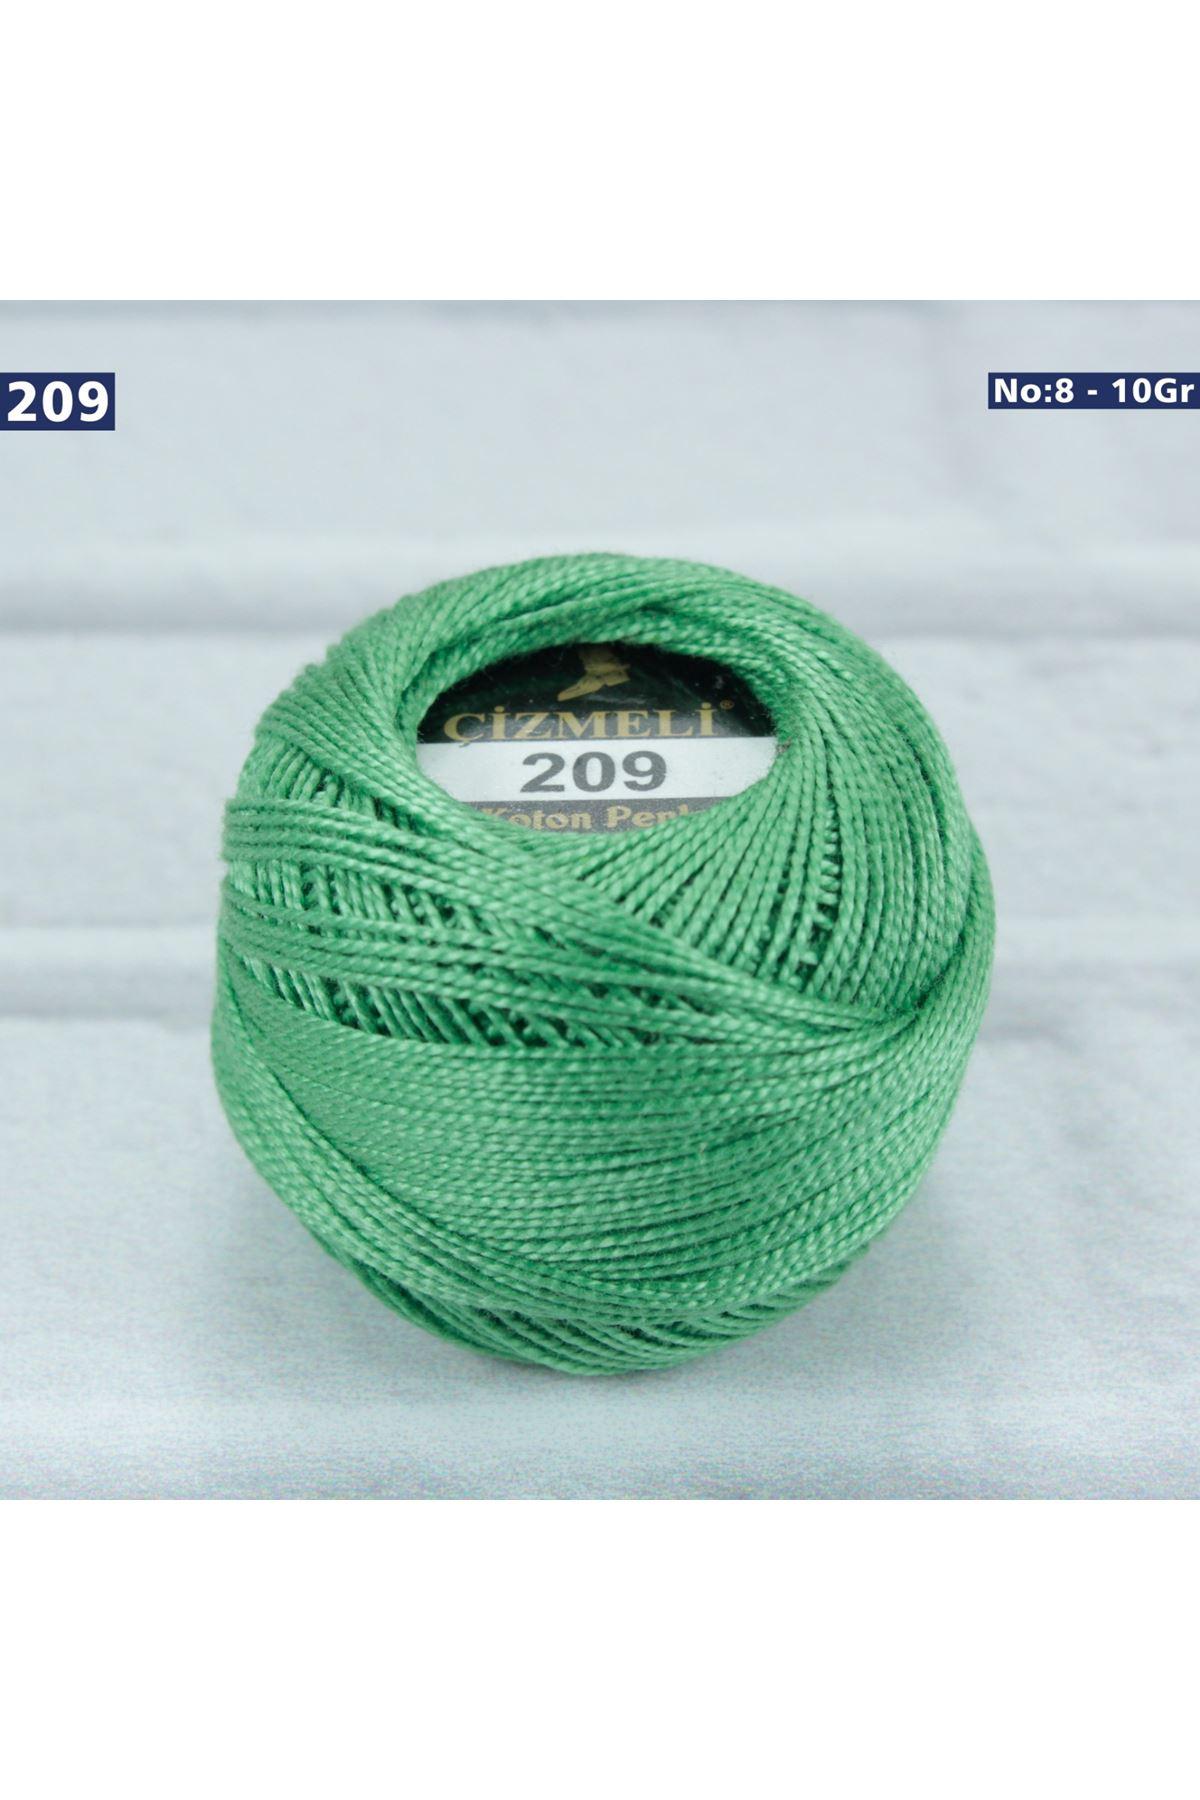 Çizmeli Cotton Perle Nakış İpliği No: 209